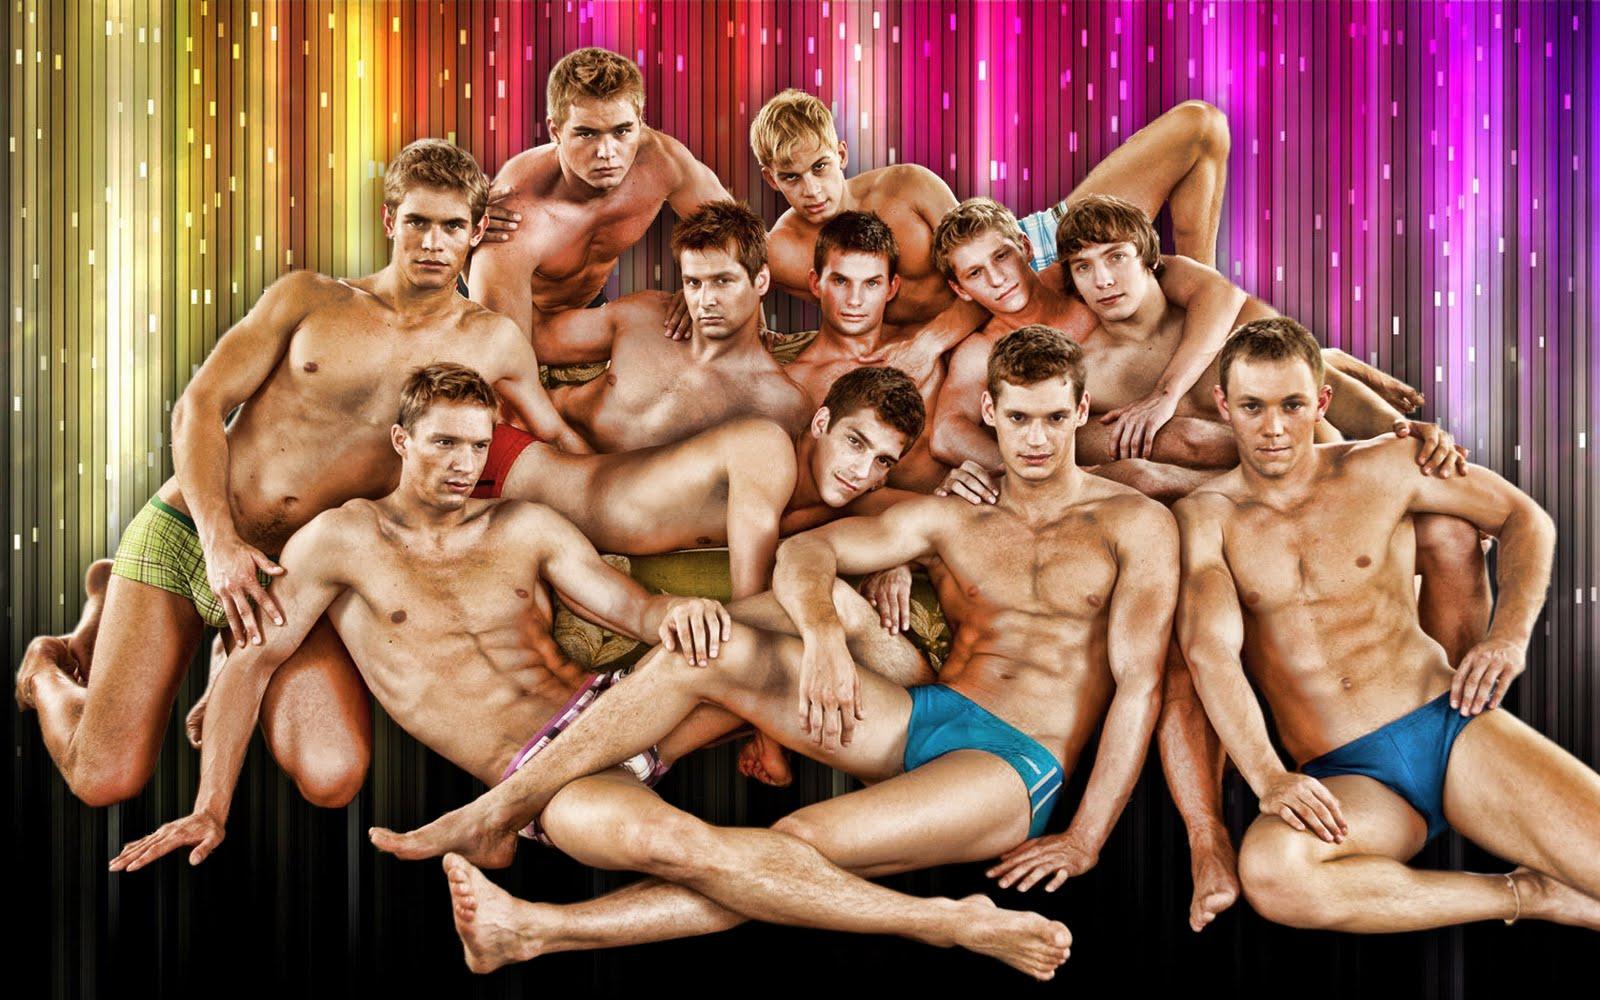 Orgy wallpaper